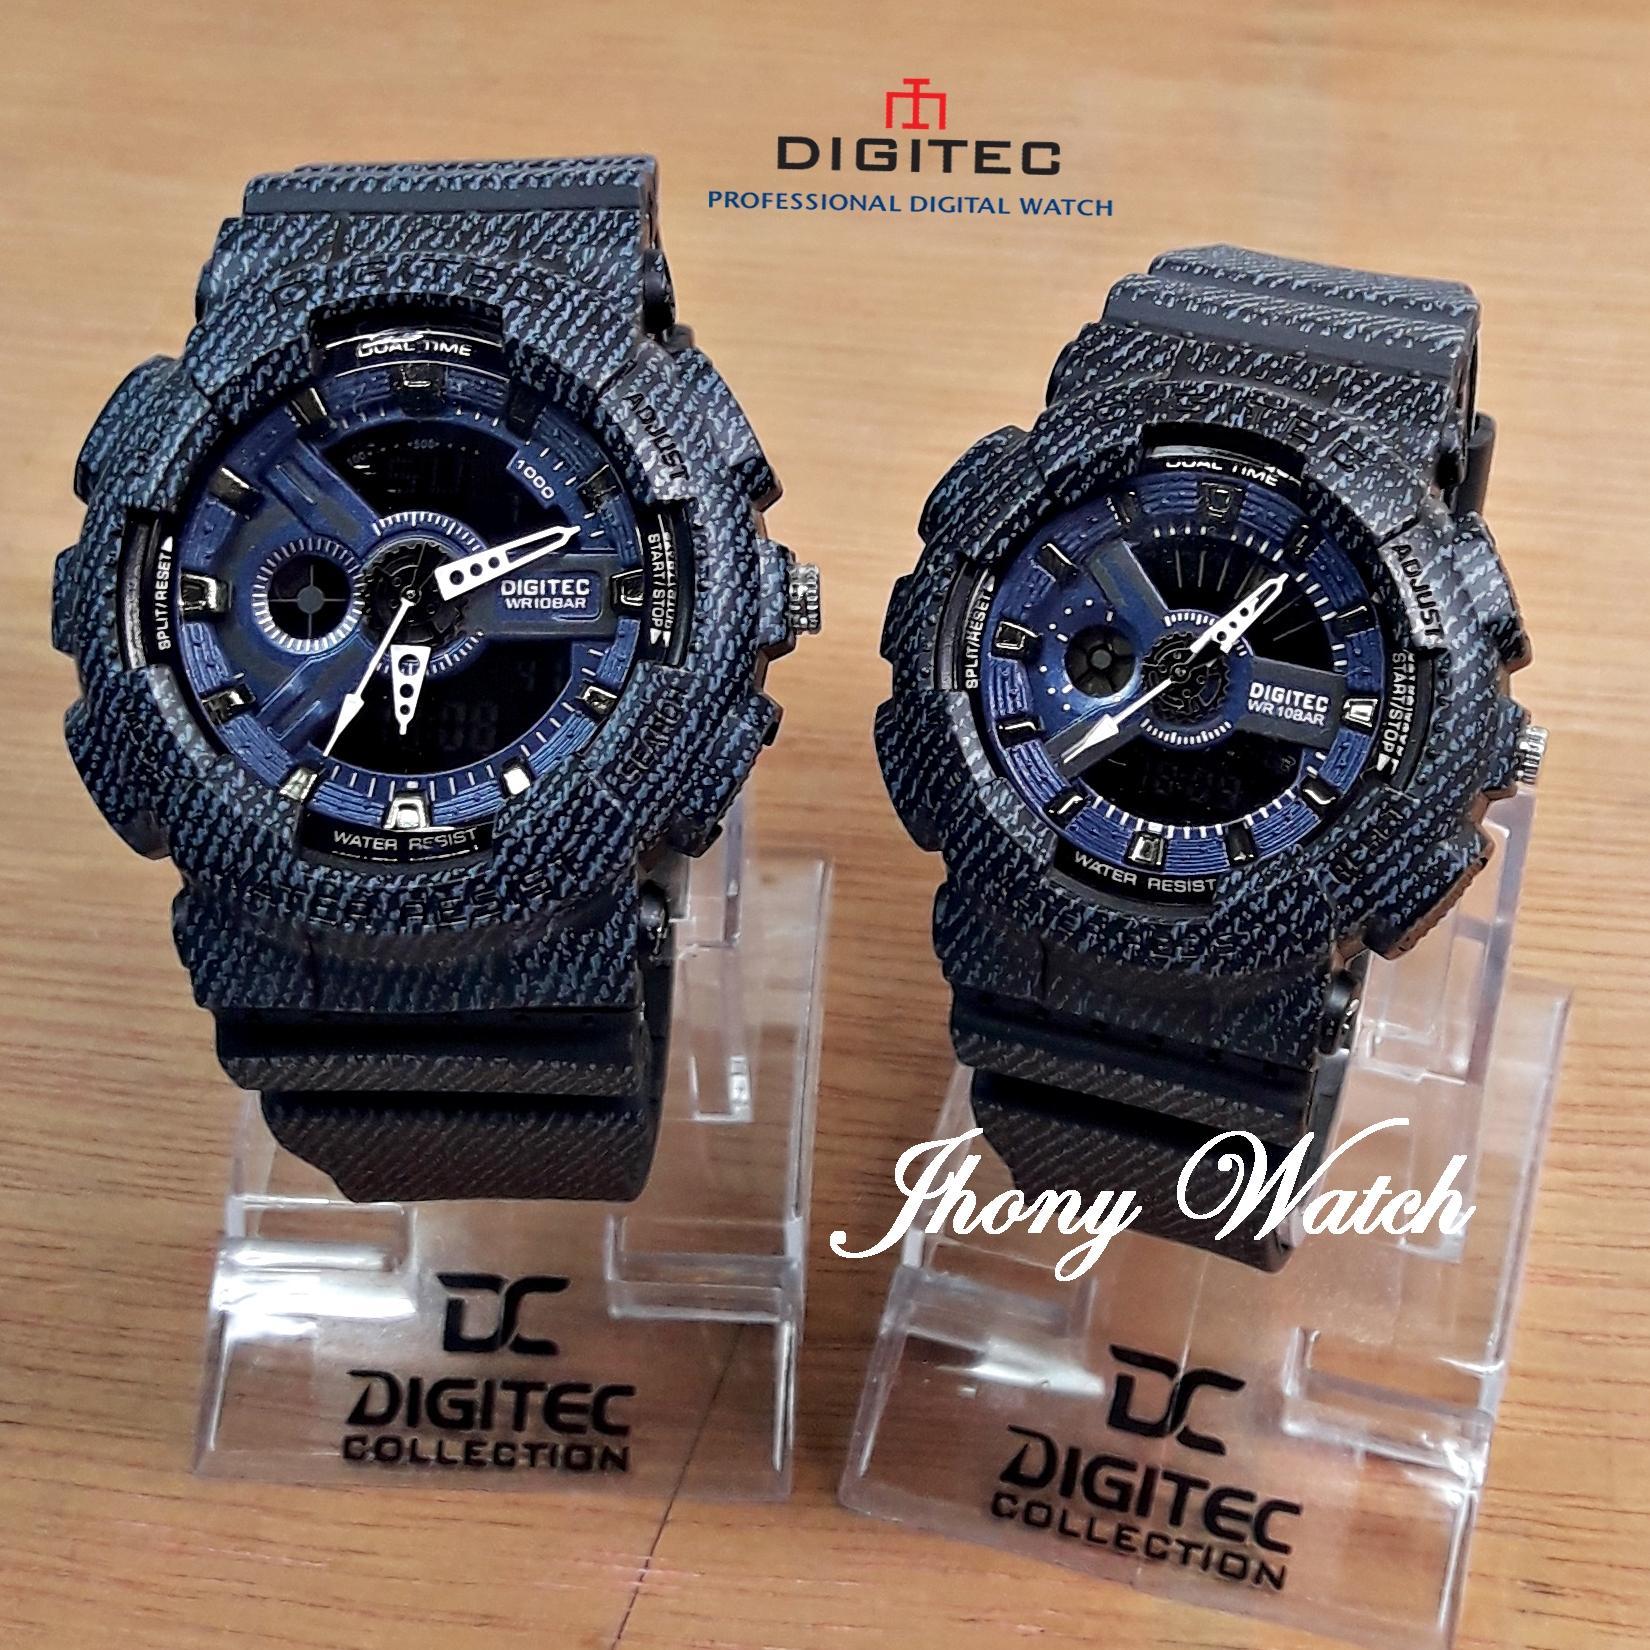 Digitec Dg2011 Dg2066 Jam Tangan Couple Dual Time Rubber Strap Sport Original Black Grey Denim Dualtime